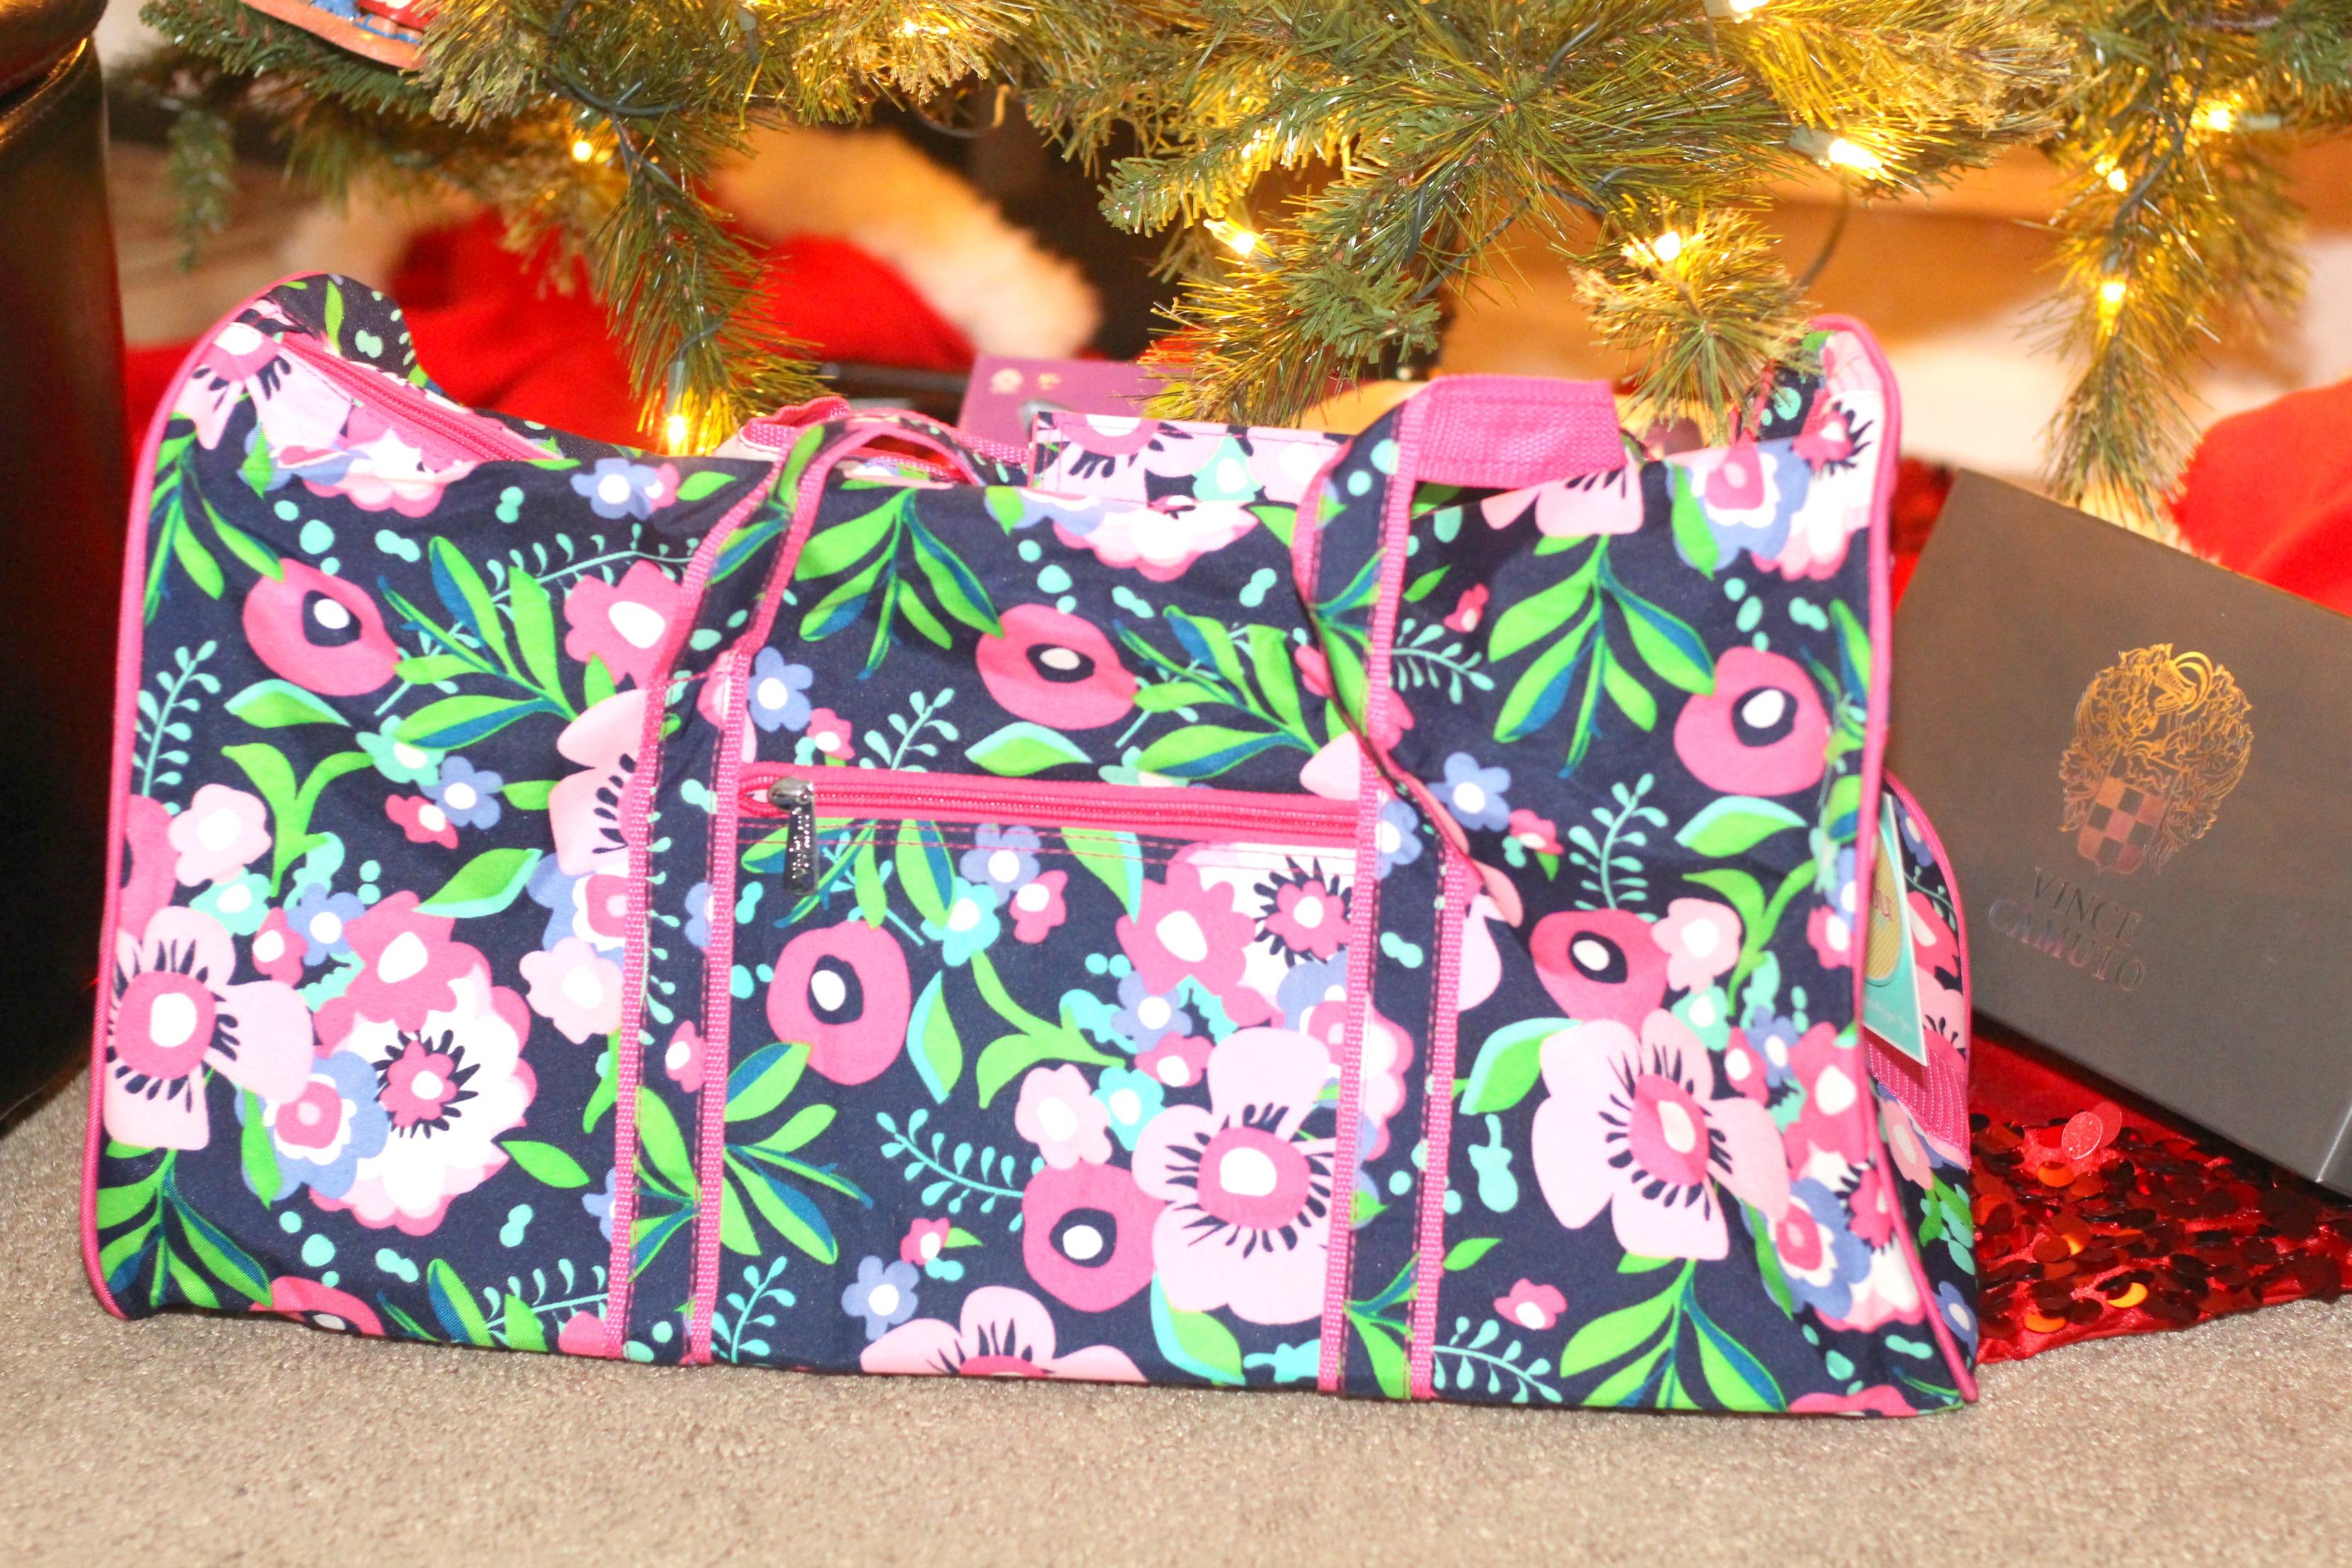 Holiday Gift Inspiration for Kids - Kidspiration Babbleboxx